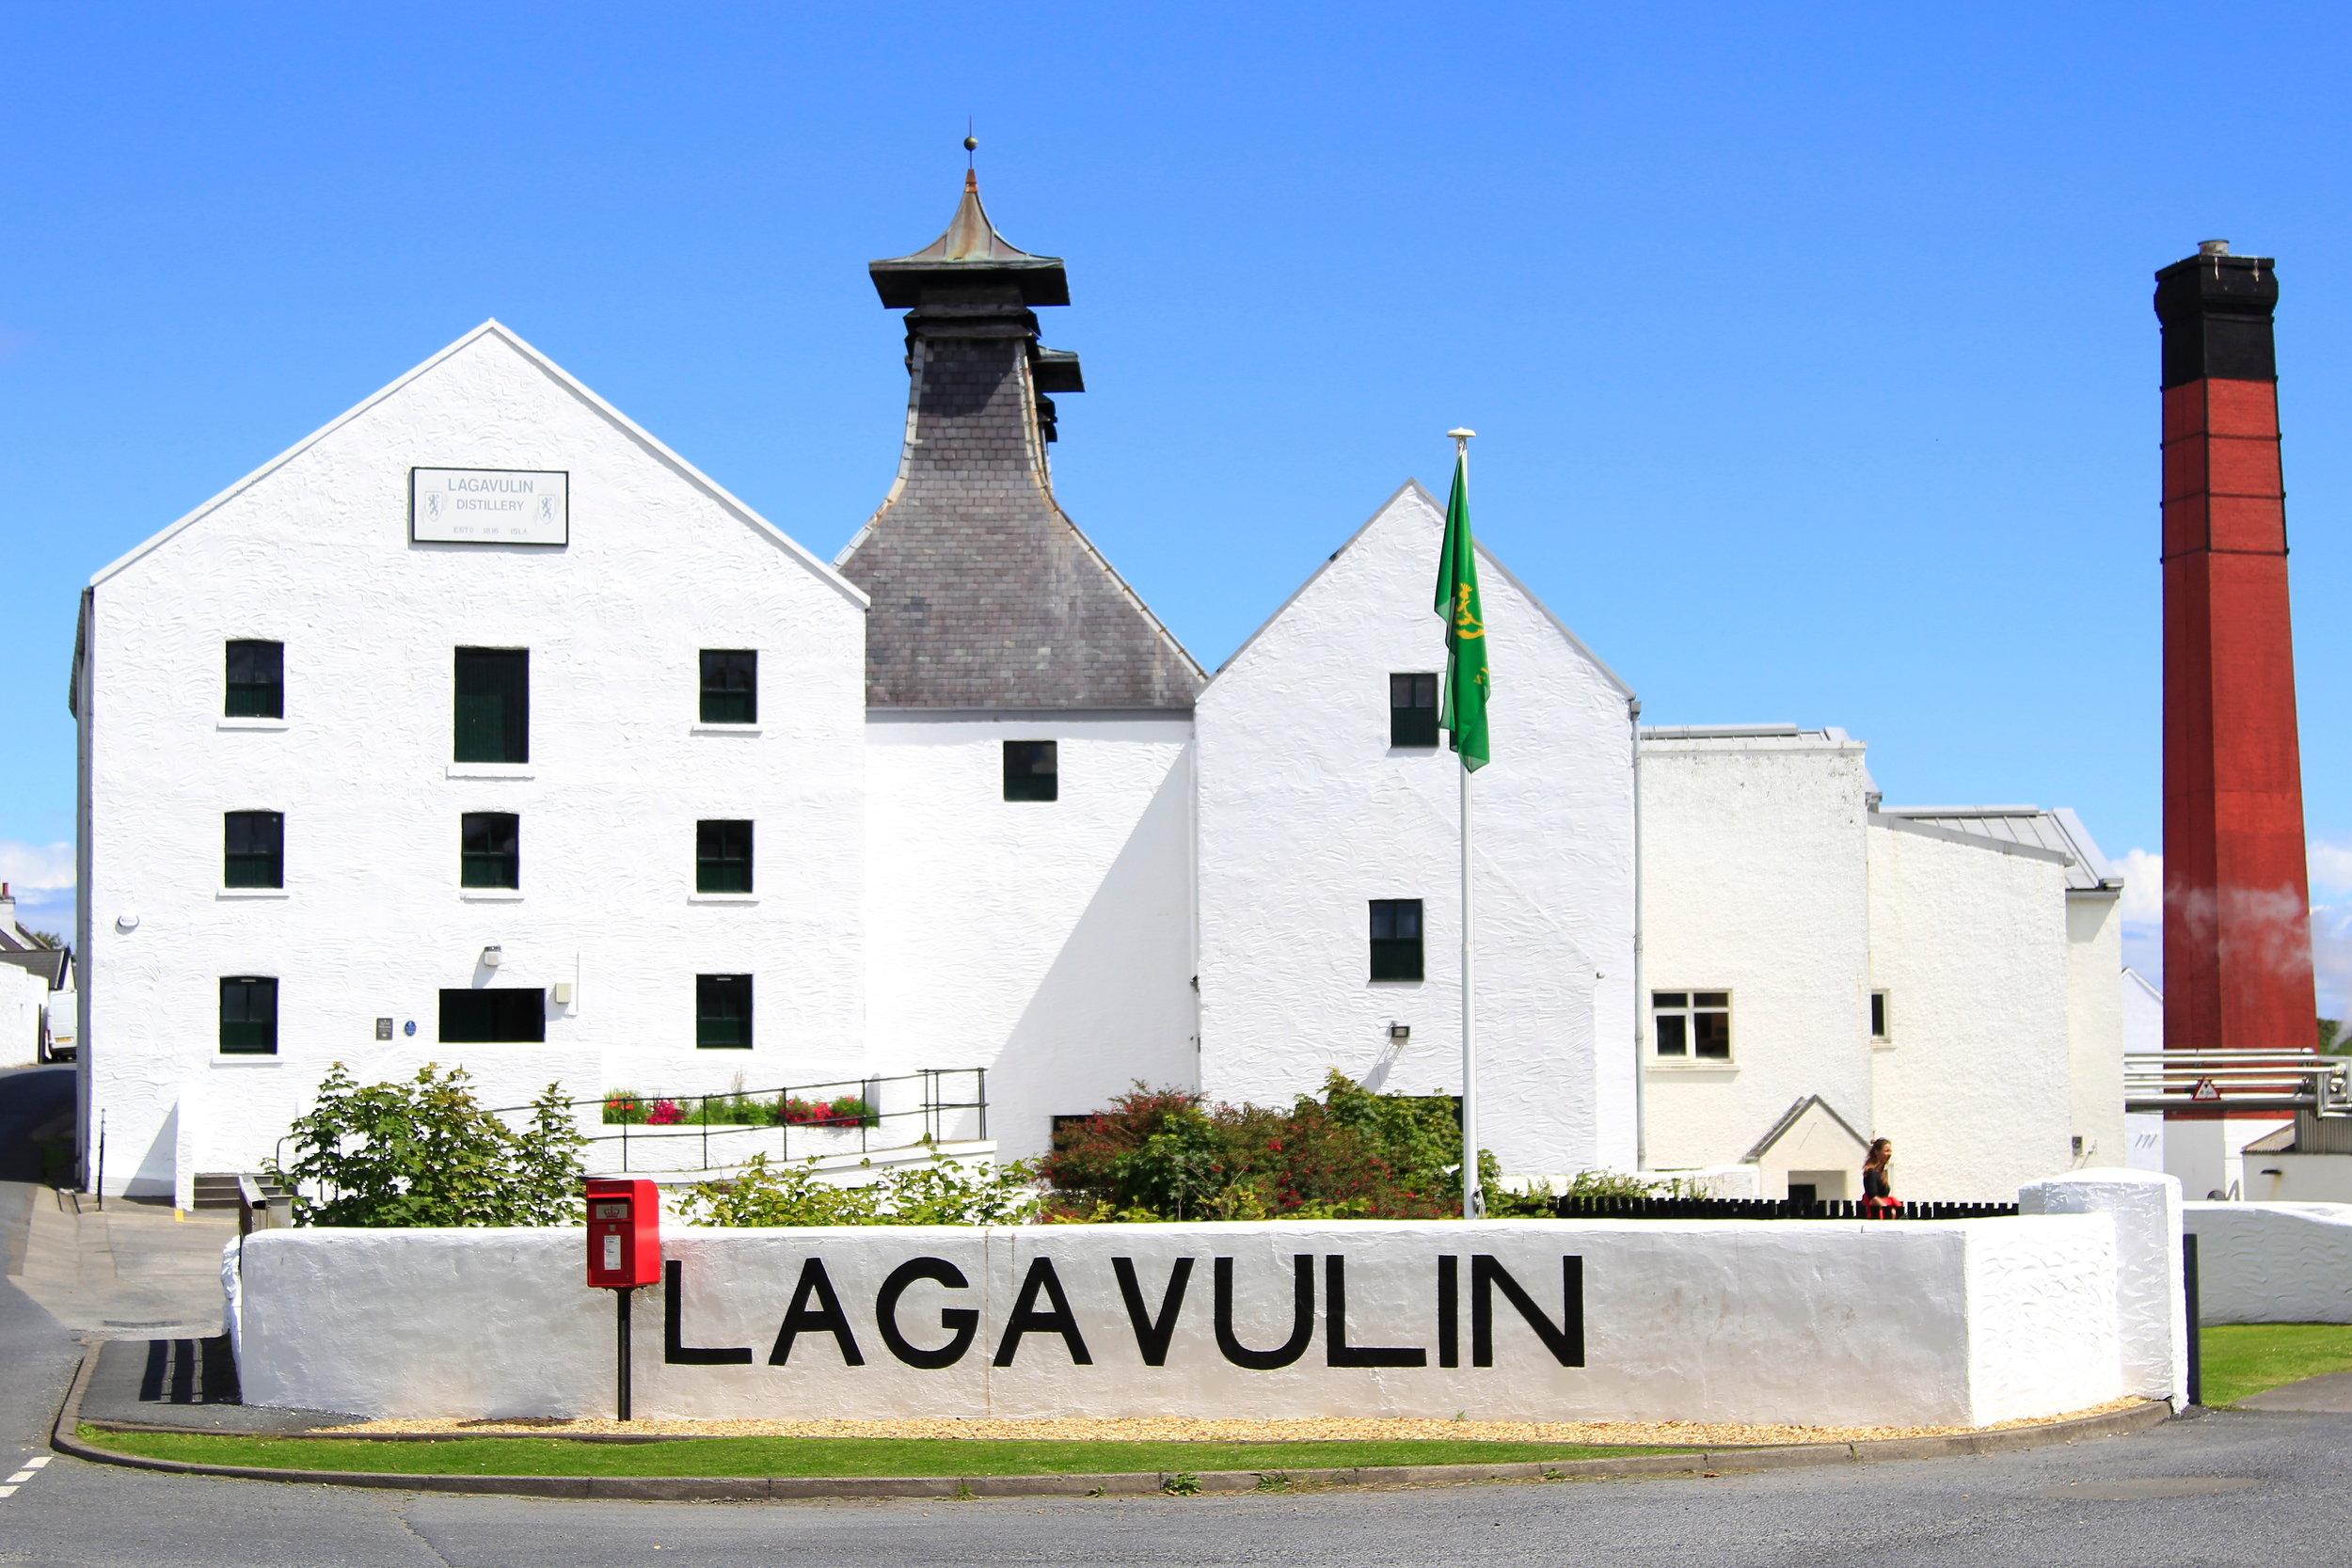 Lagavulin Distillery, Islay, Scotland